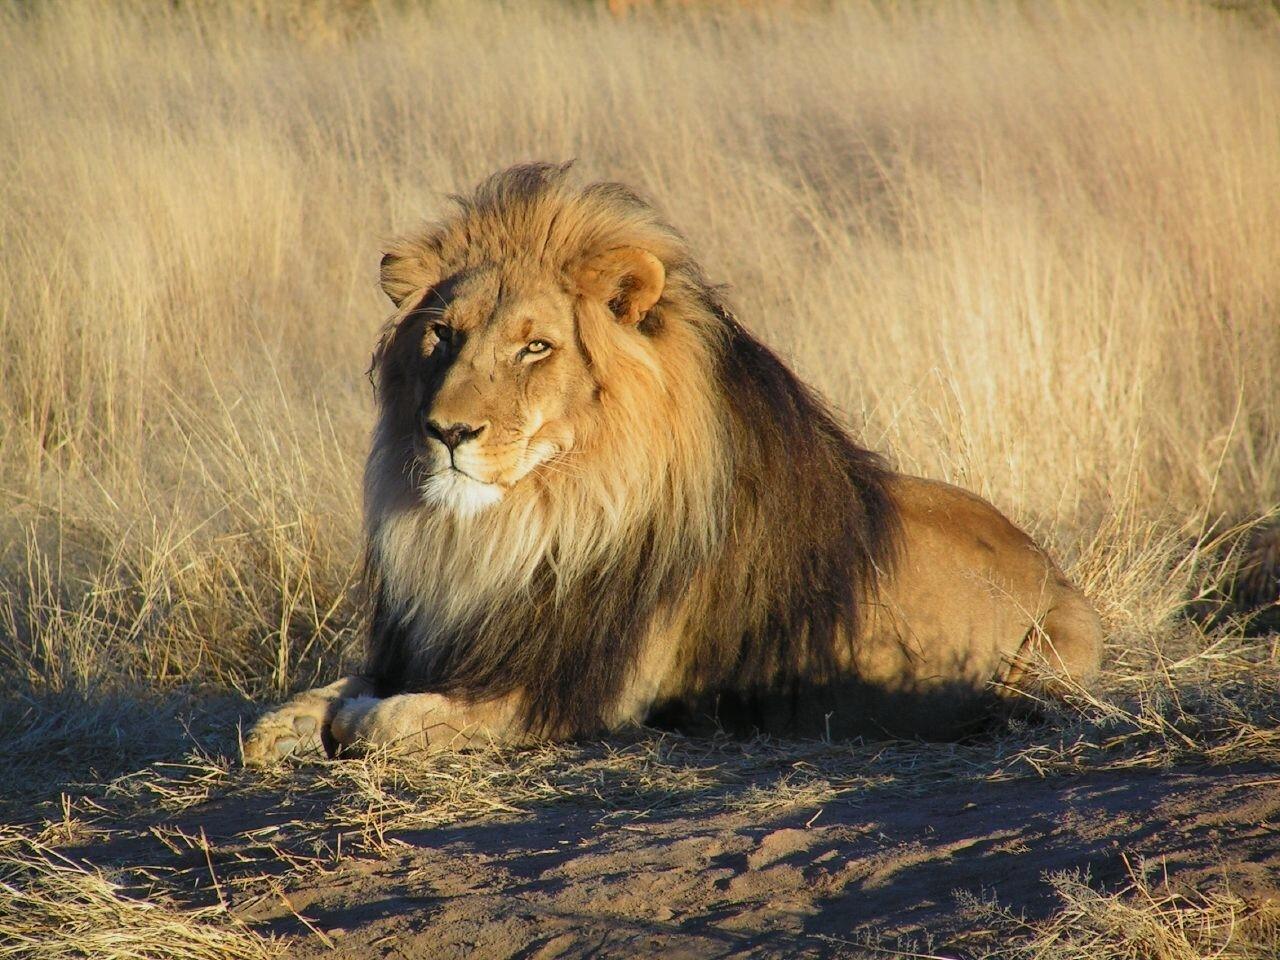 Lion sitting - photo#24